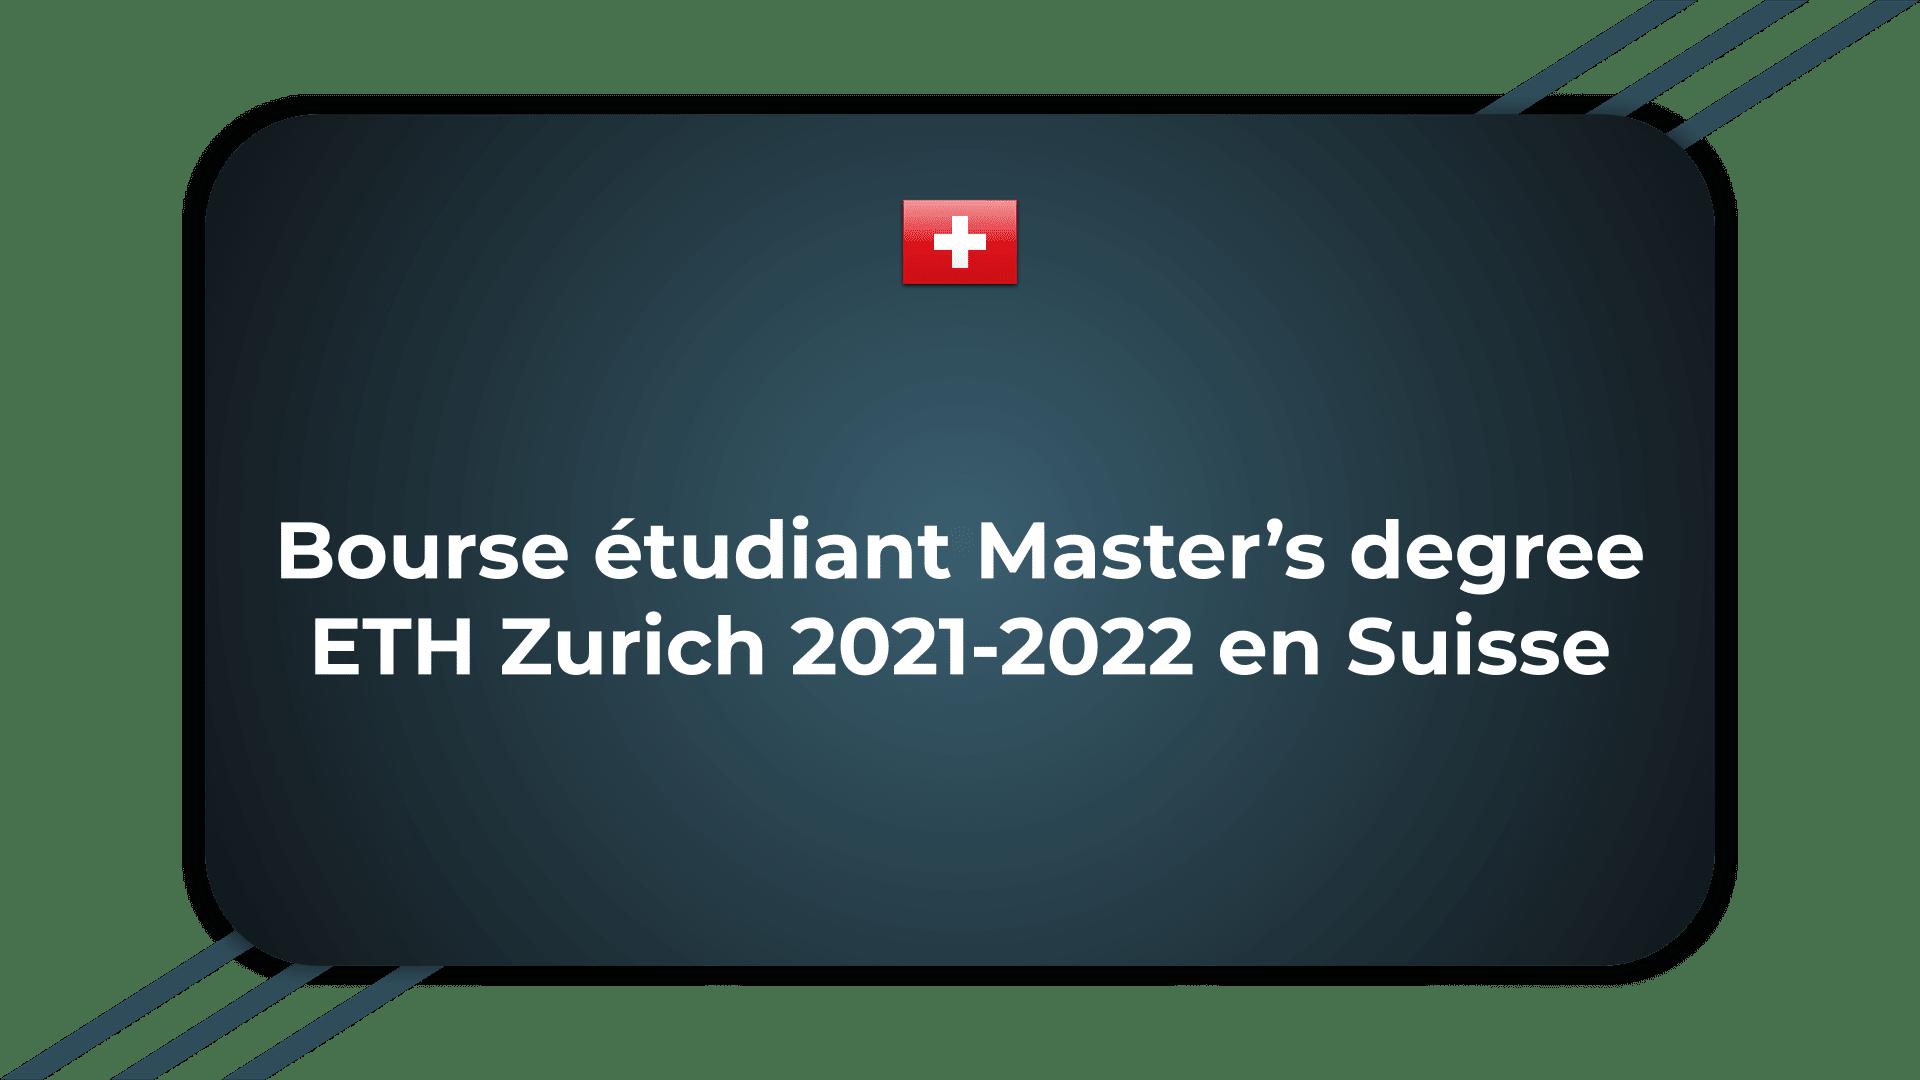 Bourse étudiant Master's degree ETH Zurich